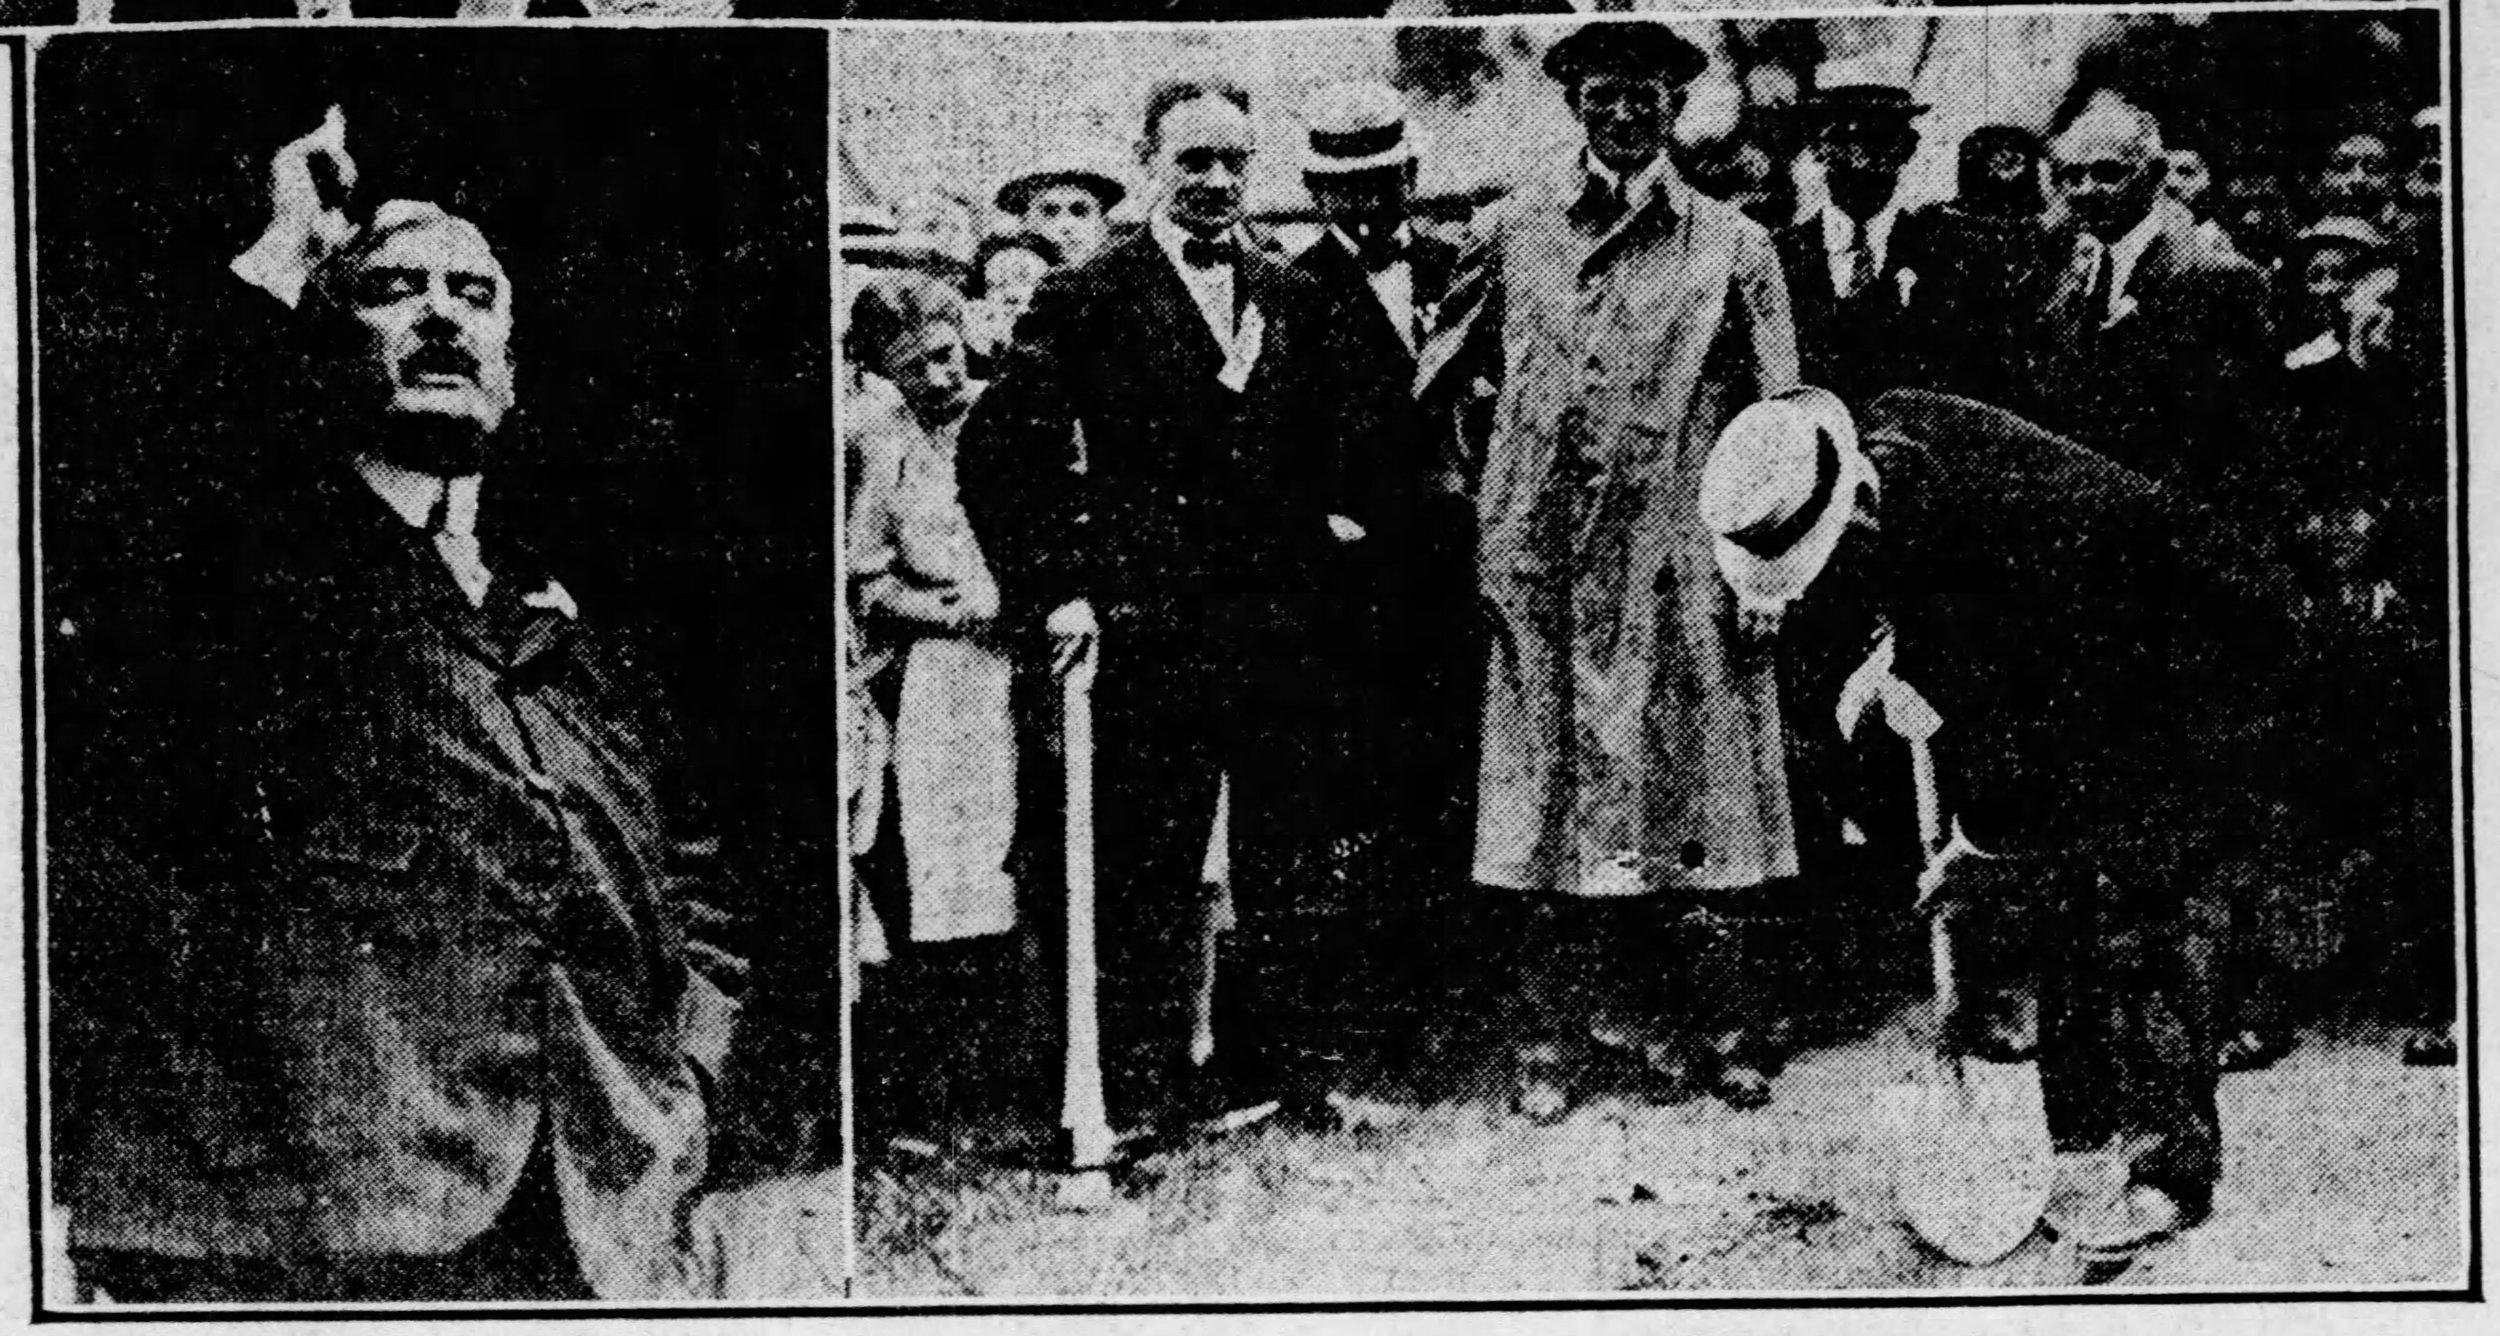 1909-07-22 The Pittsburgh Post -photo2.jpg